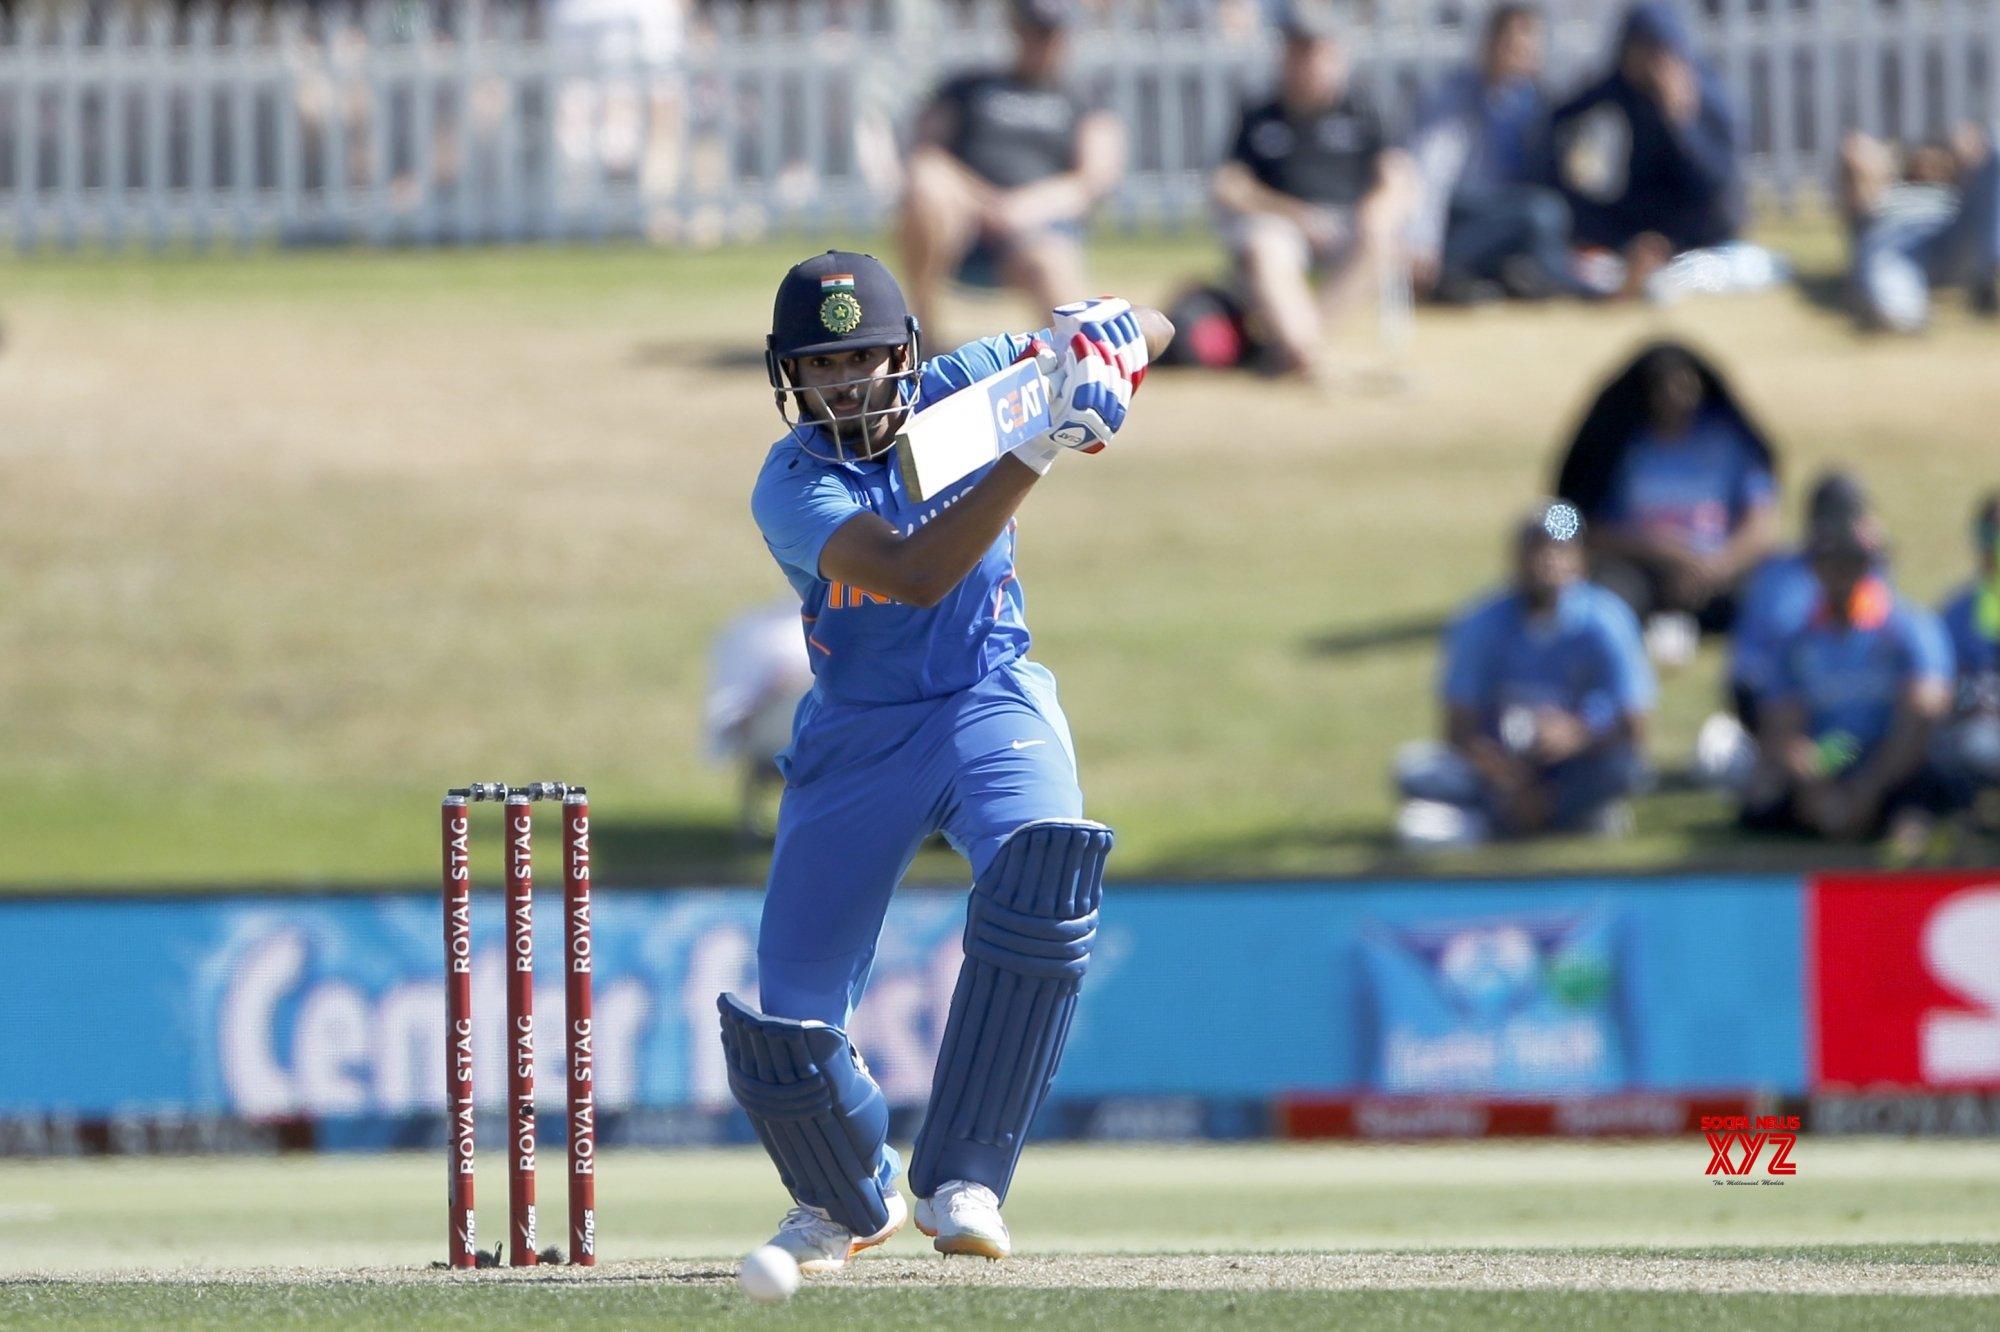 Mount Maunganui: 3rd ODI - India Vs New Zealand (Batch - 3) #Gallery